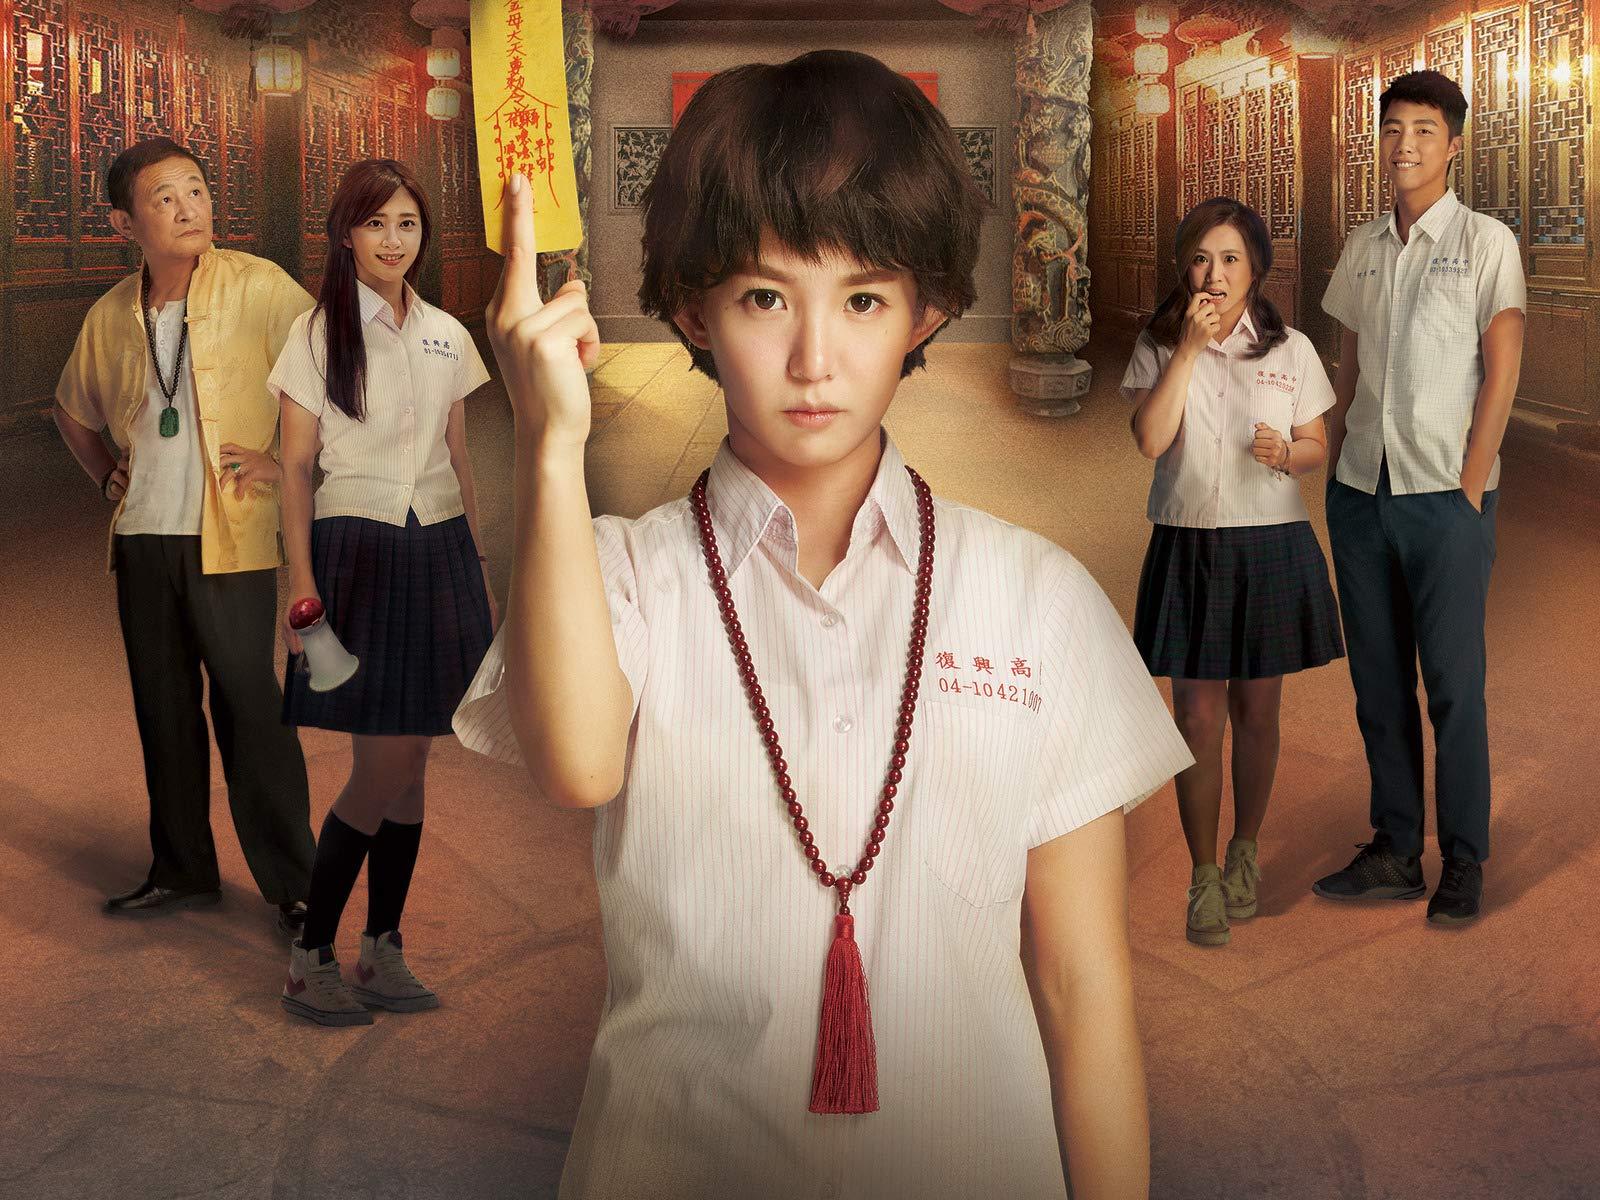 Amazon com: The Teenage Psychic - Season 1: Shu-yau Kuo